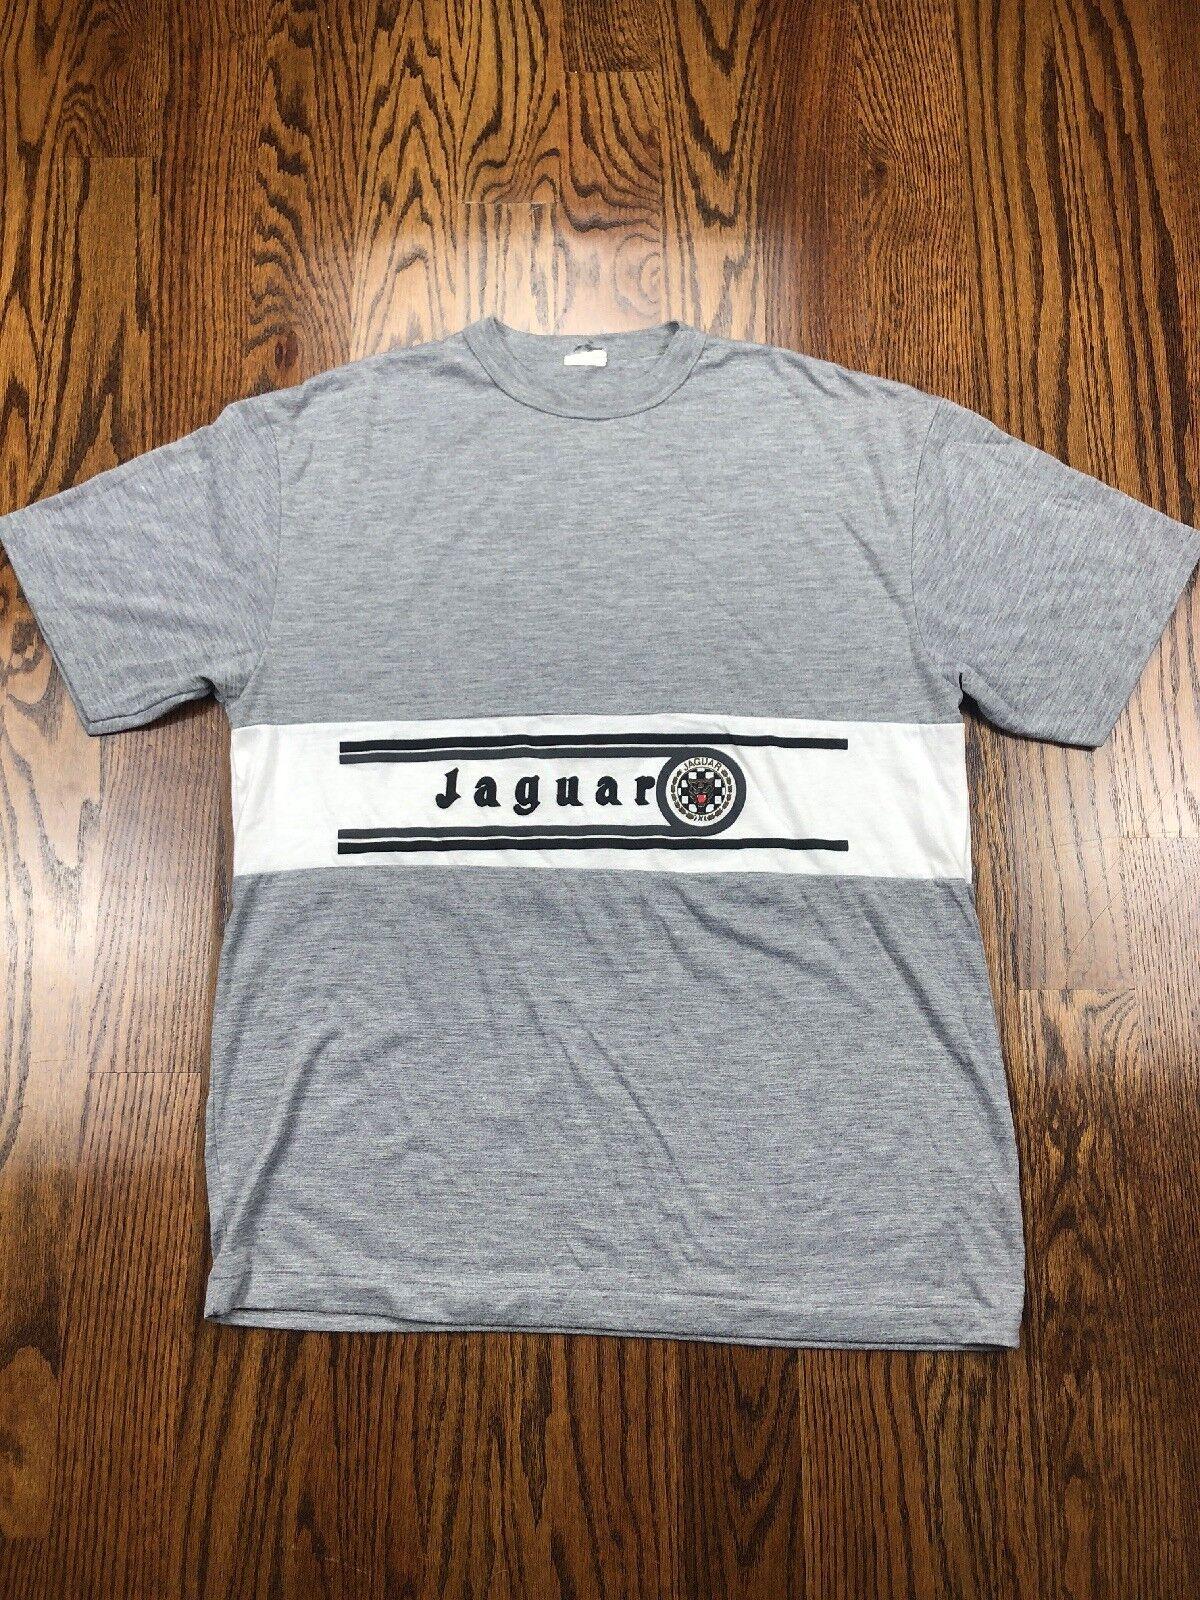 Jaguar Shirt Men's LARGE Soft VERY RARE Vintage Racing Cut Sew Single Stitch